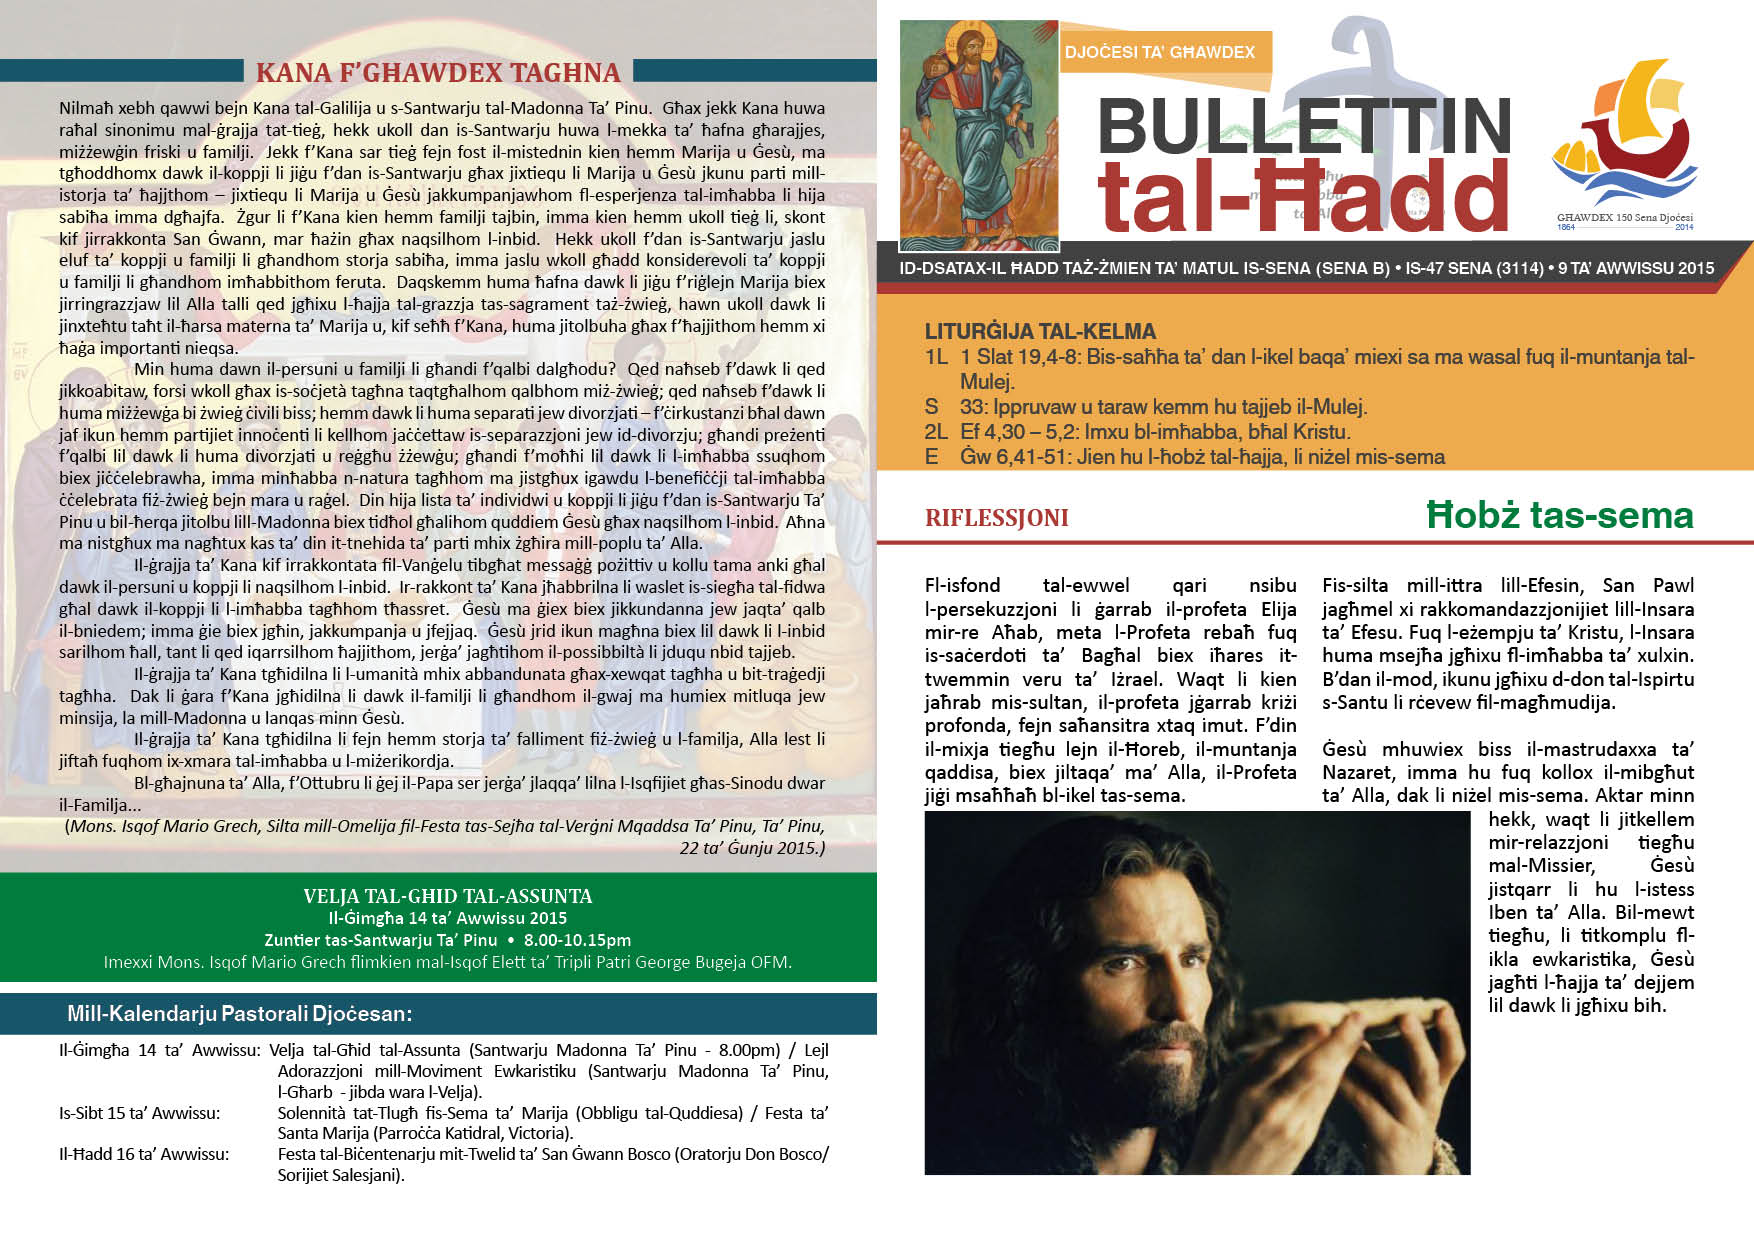 bullettin-2015-awwissu-09.jpg